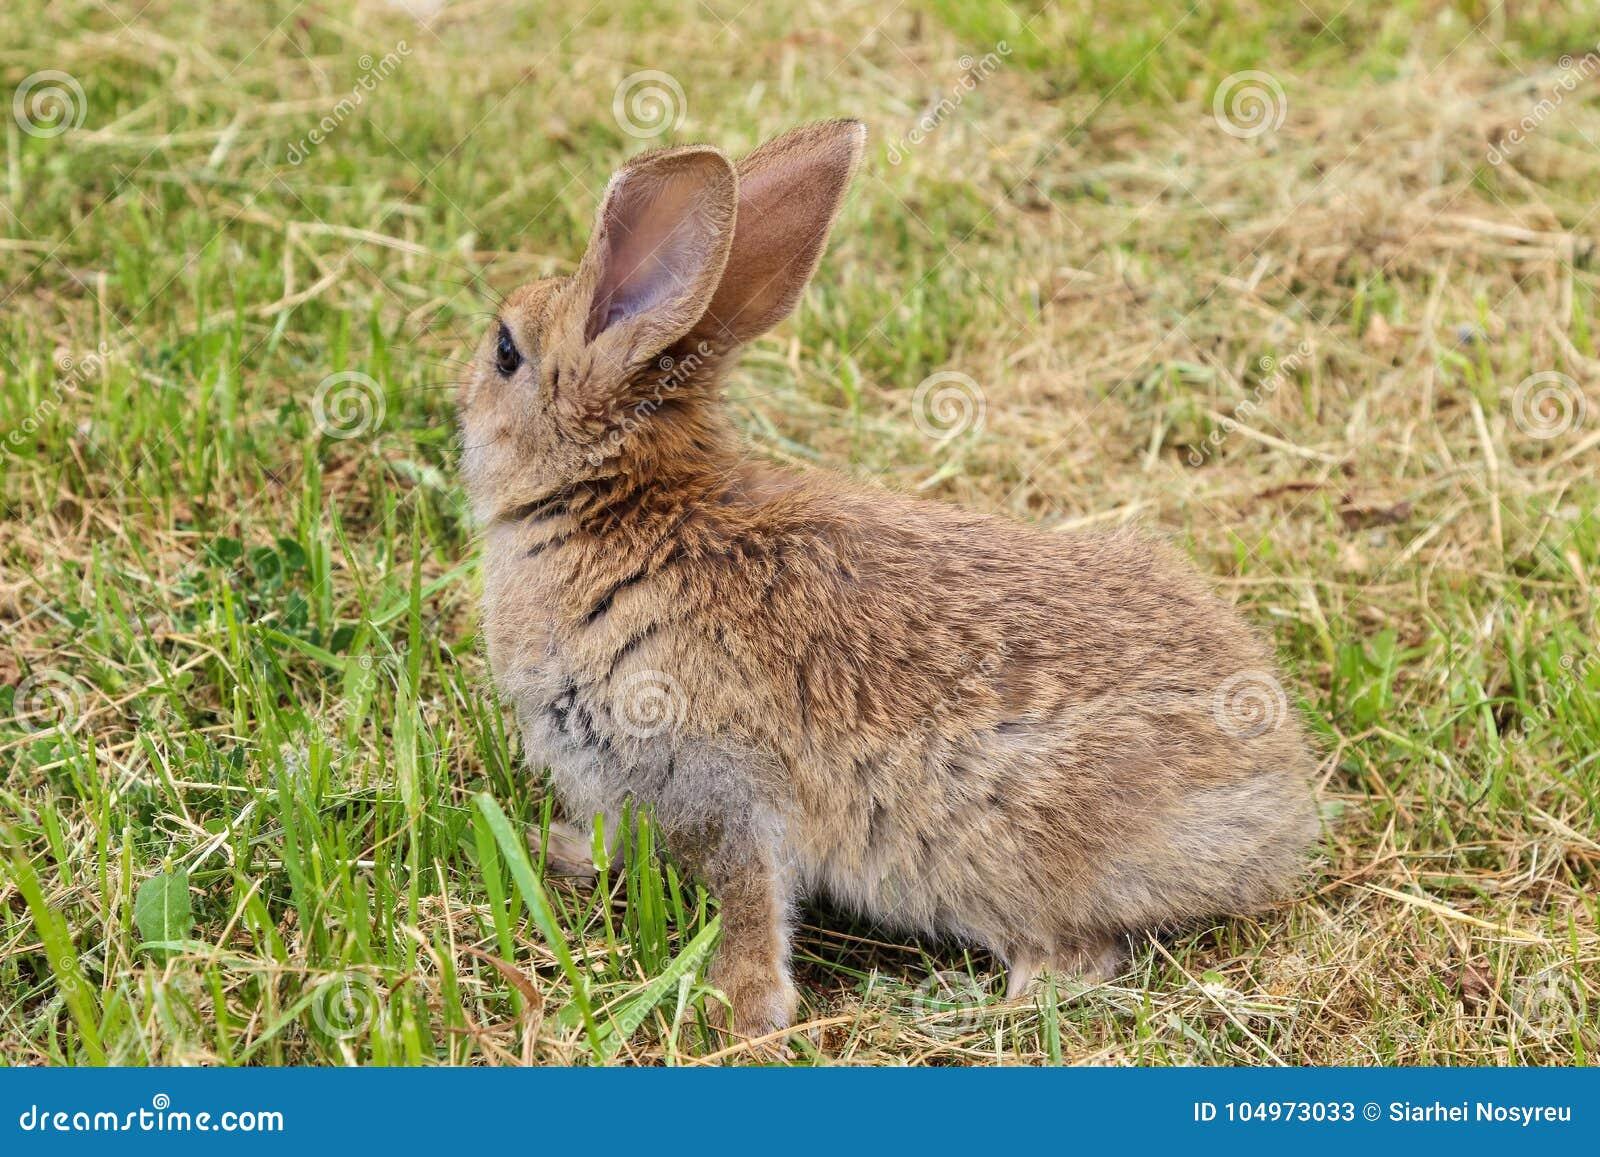 Grey rabbit sitting on green grass decided to run away.